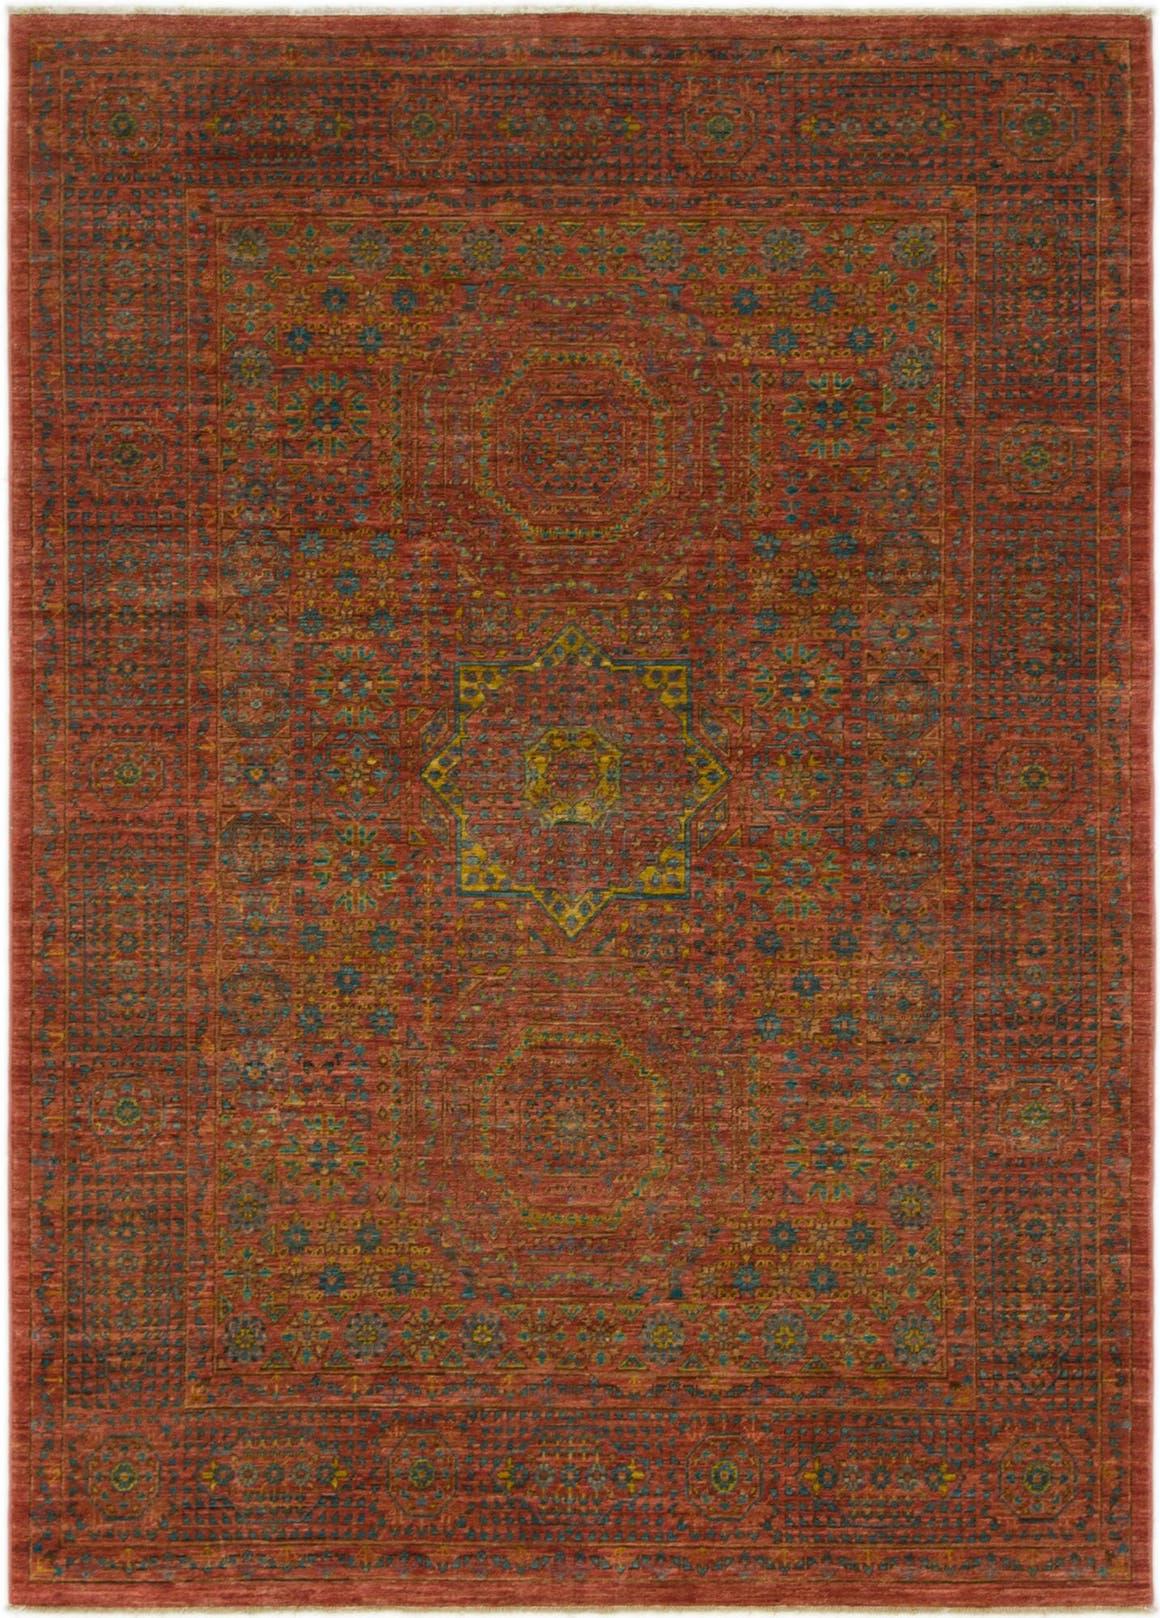 5' x 7' Mamluk Ziegler Oriental Rug main image